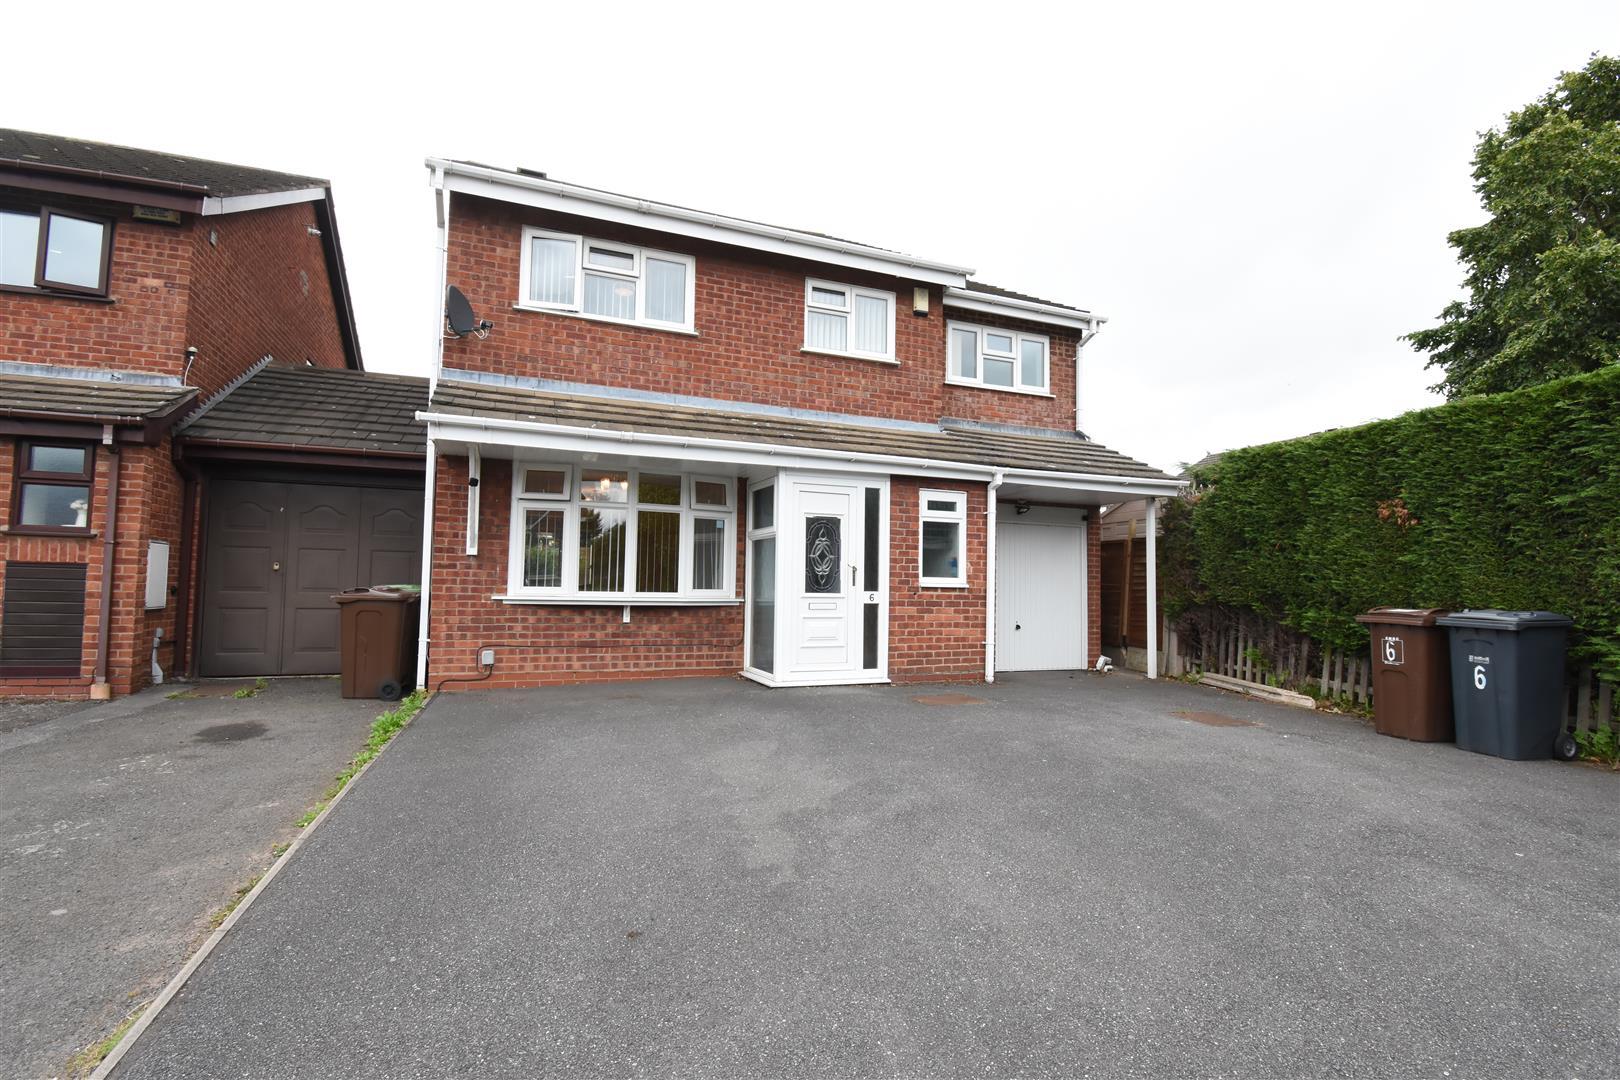 5 bed house for sale in Delamere Close, Castle Bromwich, Birmingham, B36